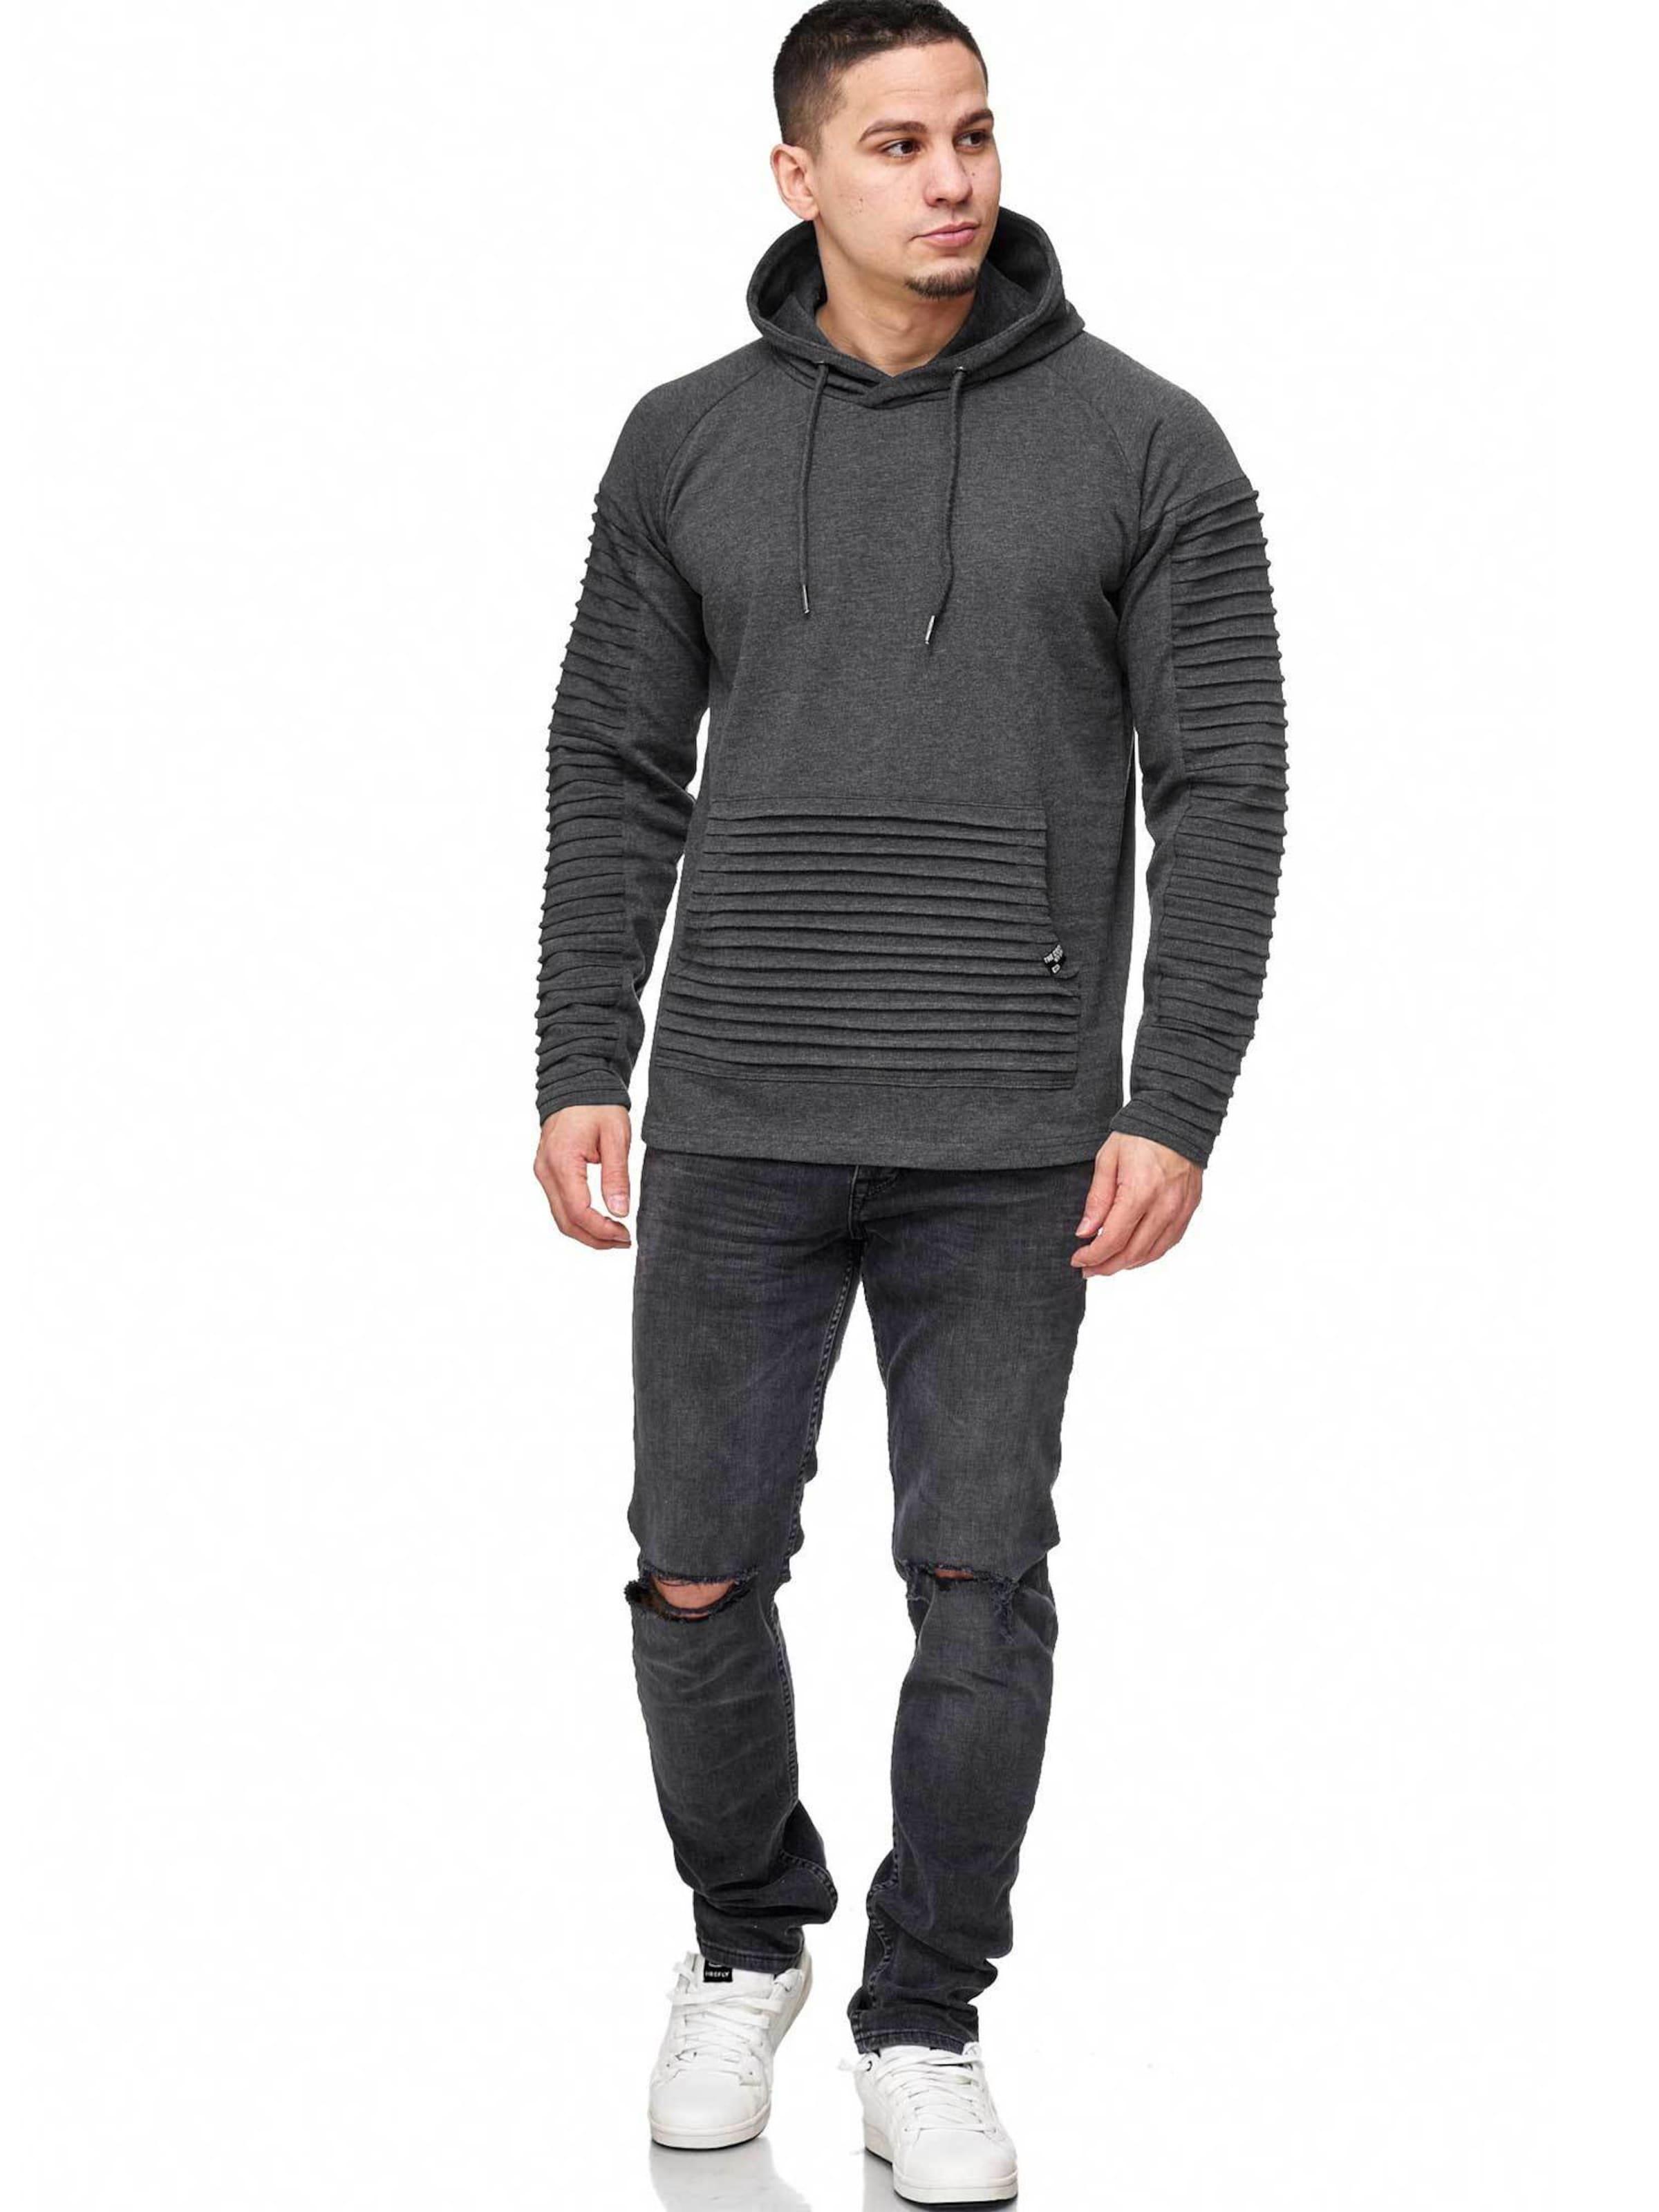 Jeans Sweat 'lewisville' Noir Indicode En shirt T13uKJclF